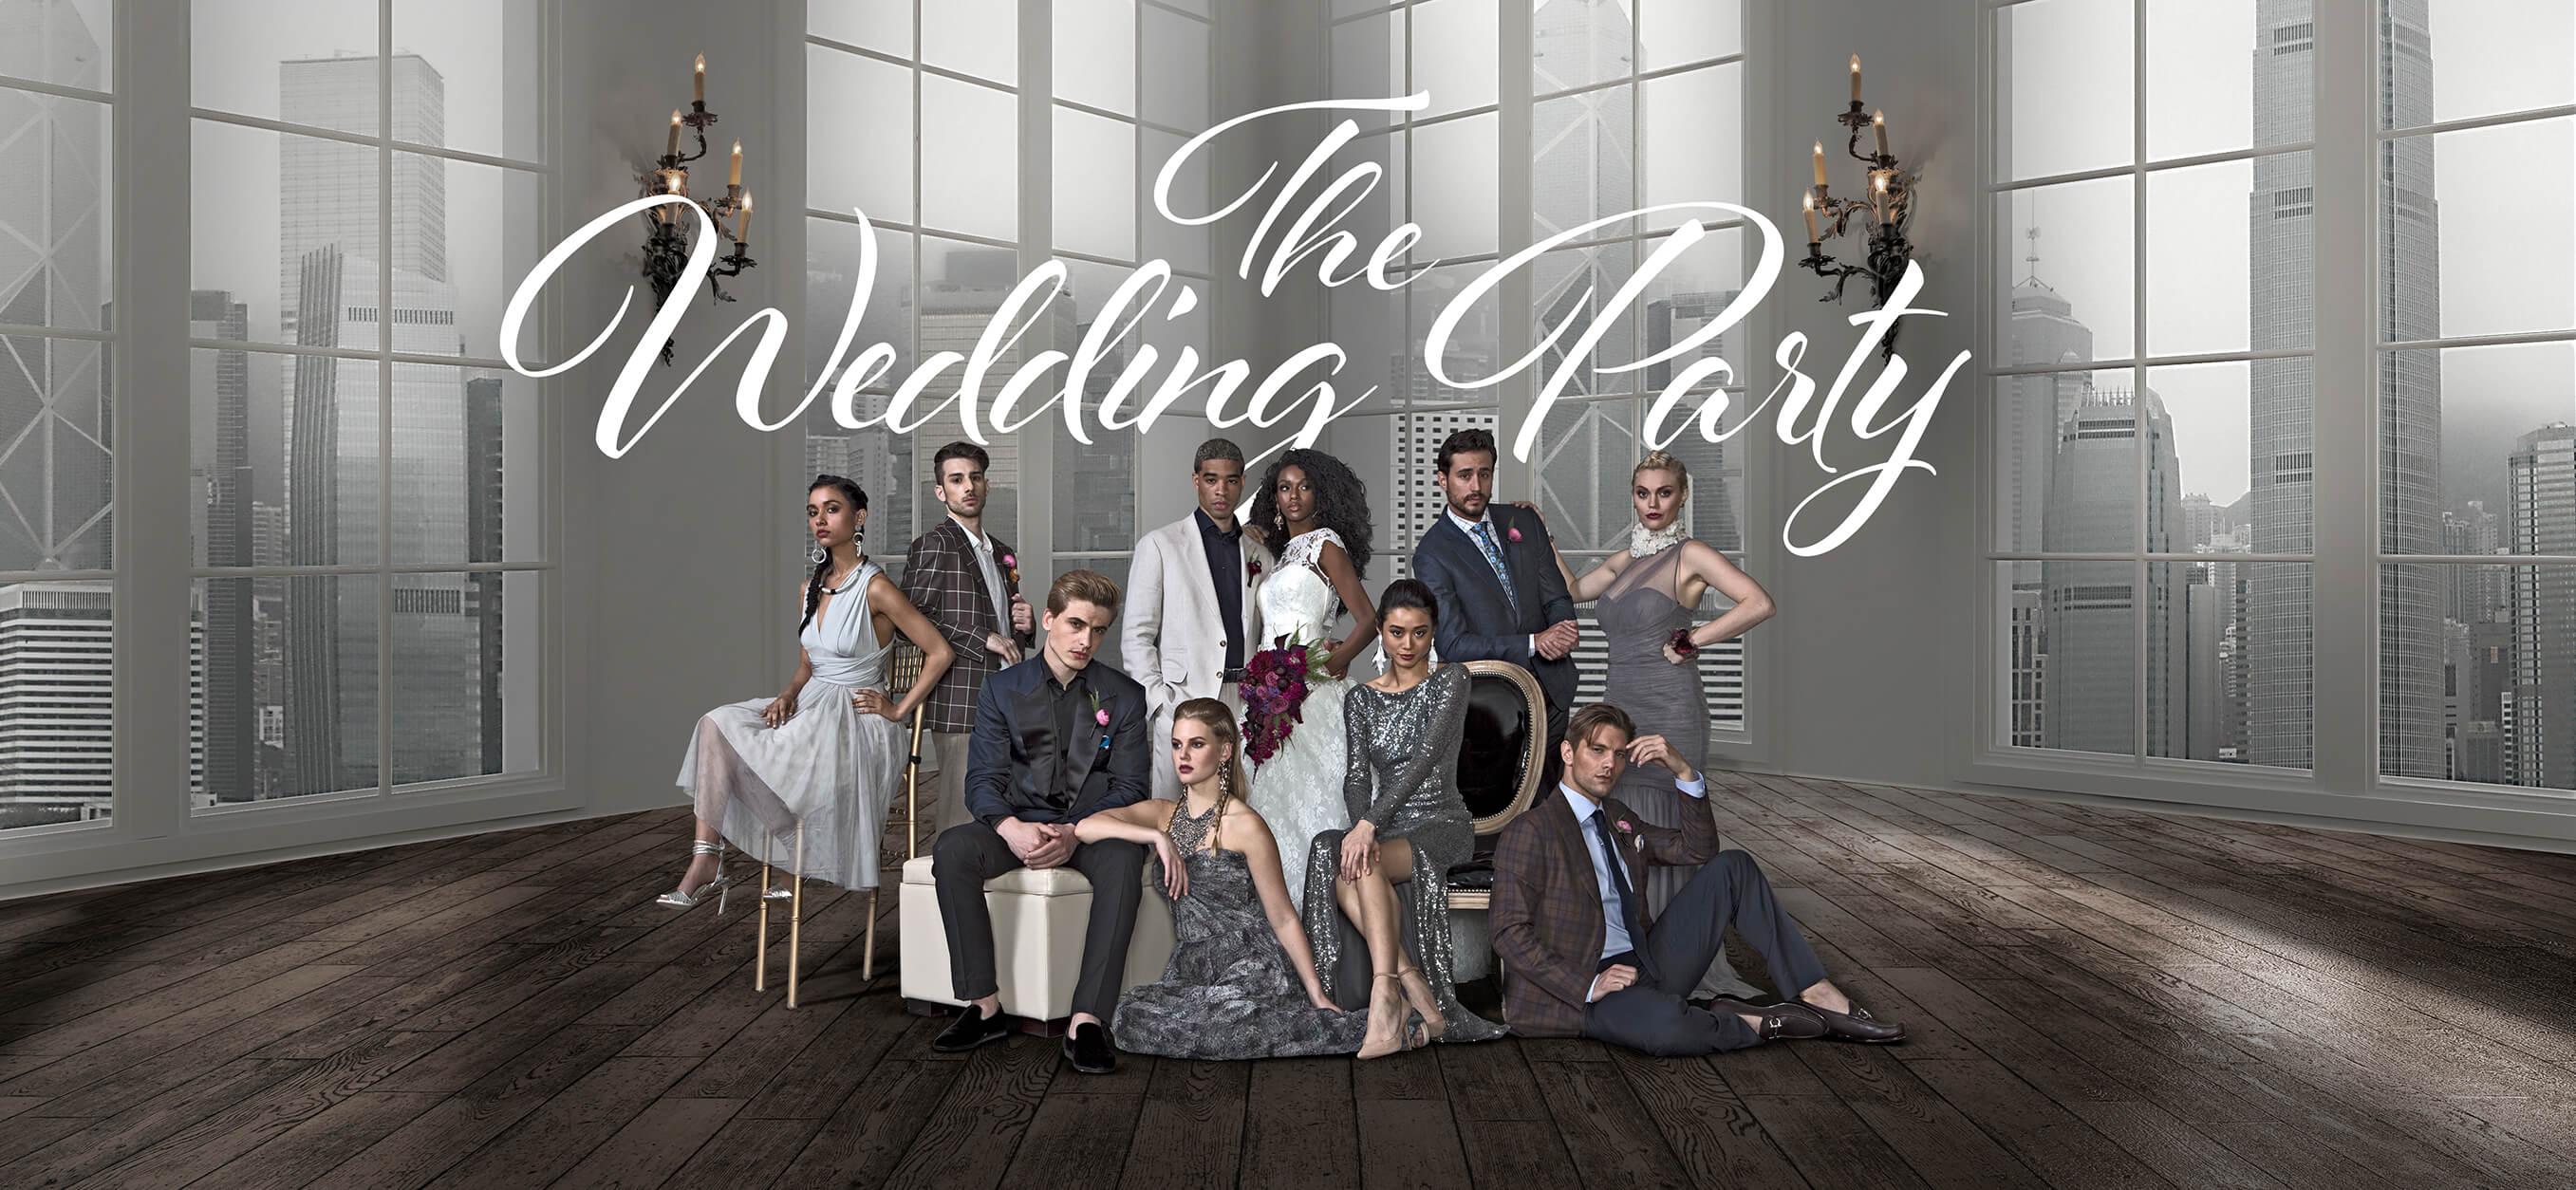 backyard wedding venues in orange county ca%0A Experience